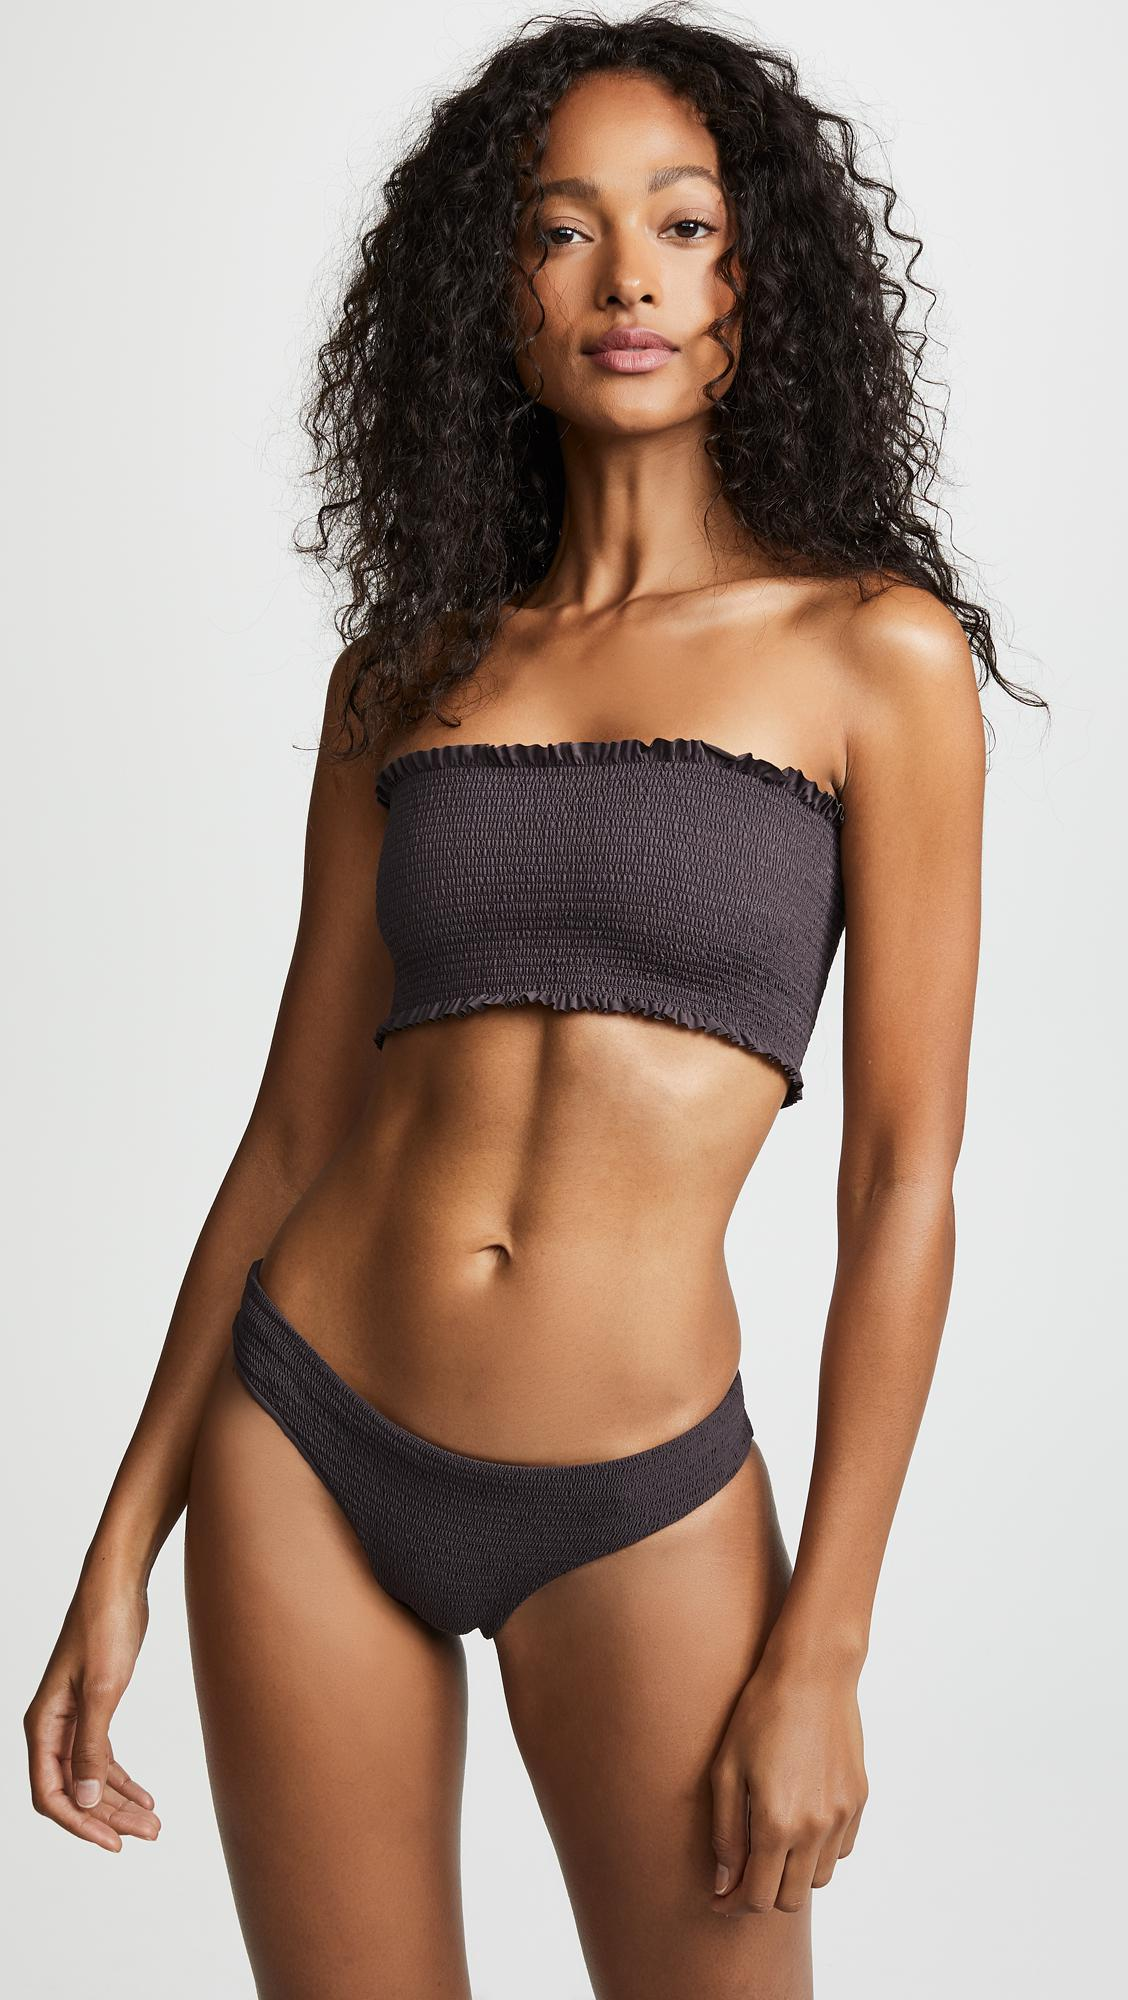 ca548c1d631c4 Lyst - Pilyq Coco Smocked Bandeau Bikini Top